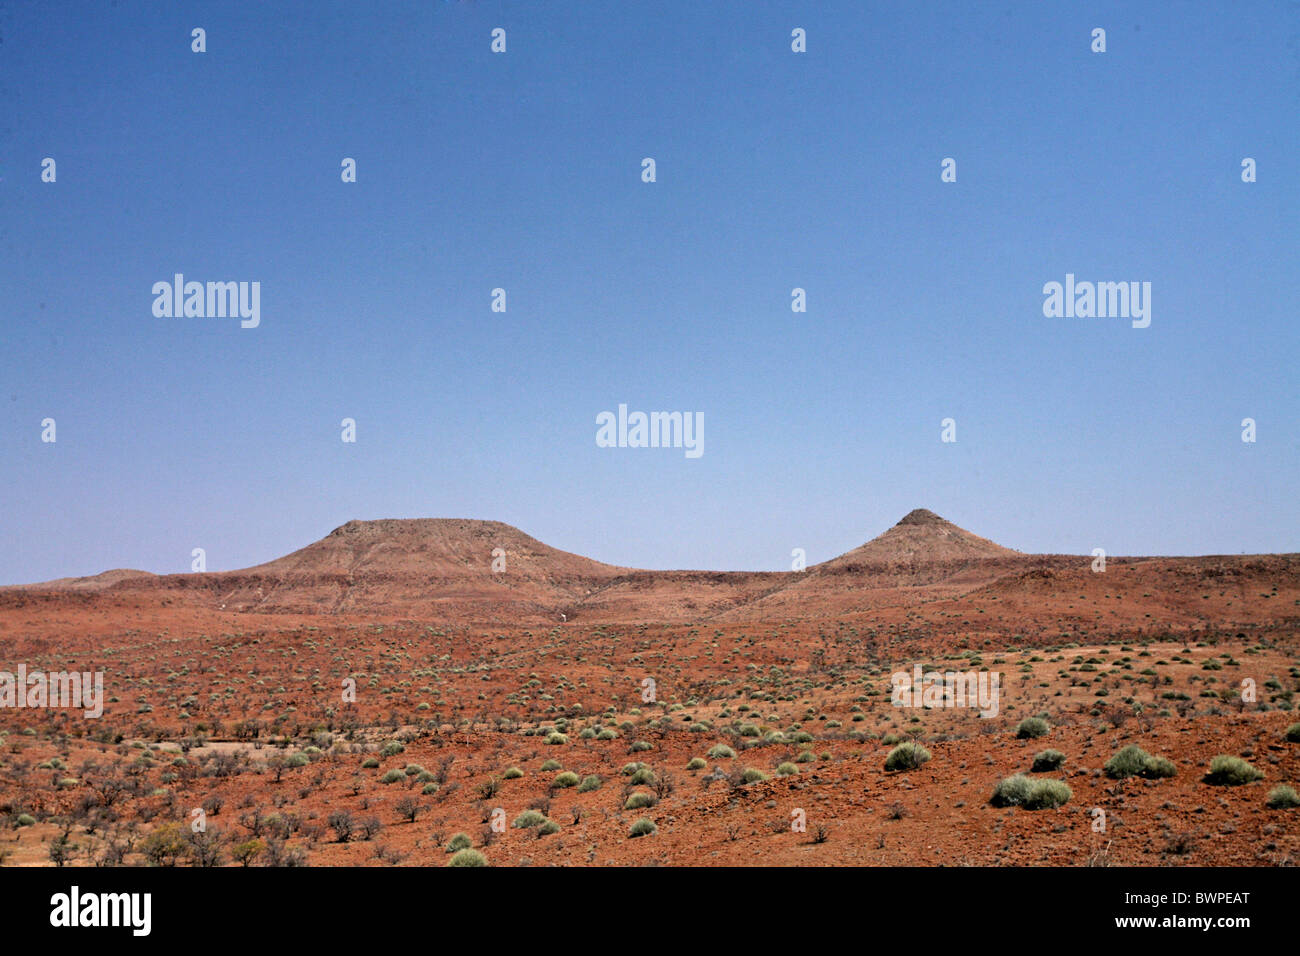 Namibia Africa Summer 2007 Africa landscape desert steppe blue sky - Stock Image